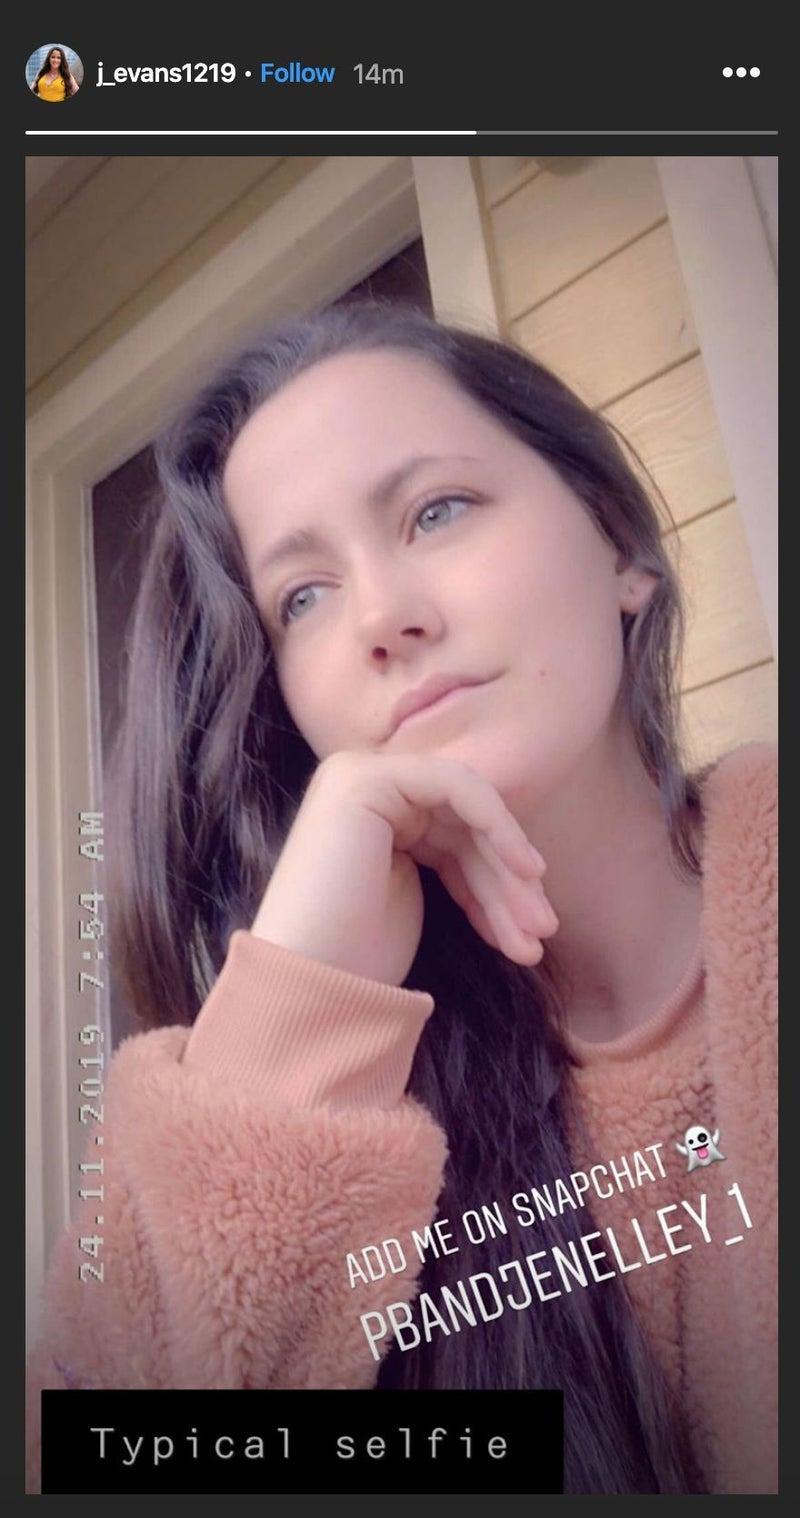 jenelle-evans-typical-selfie-snapchat